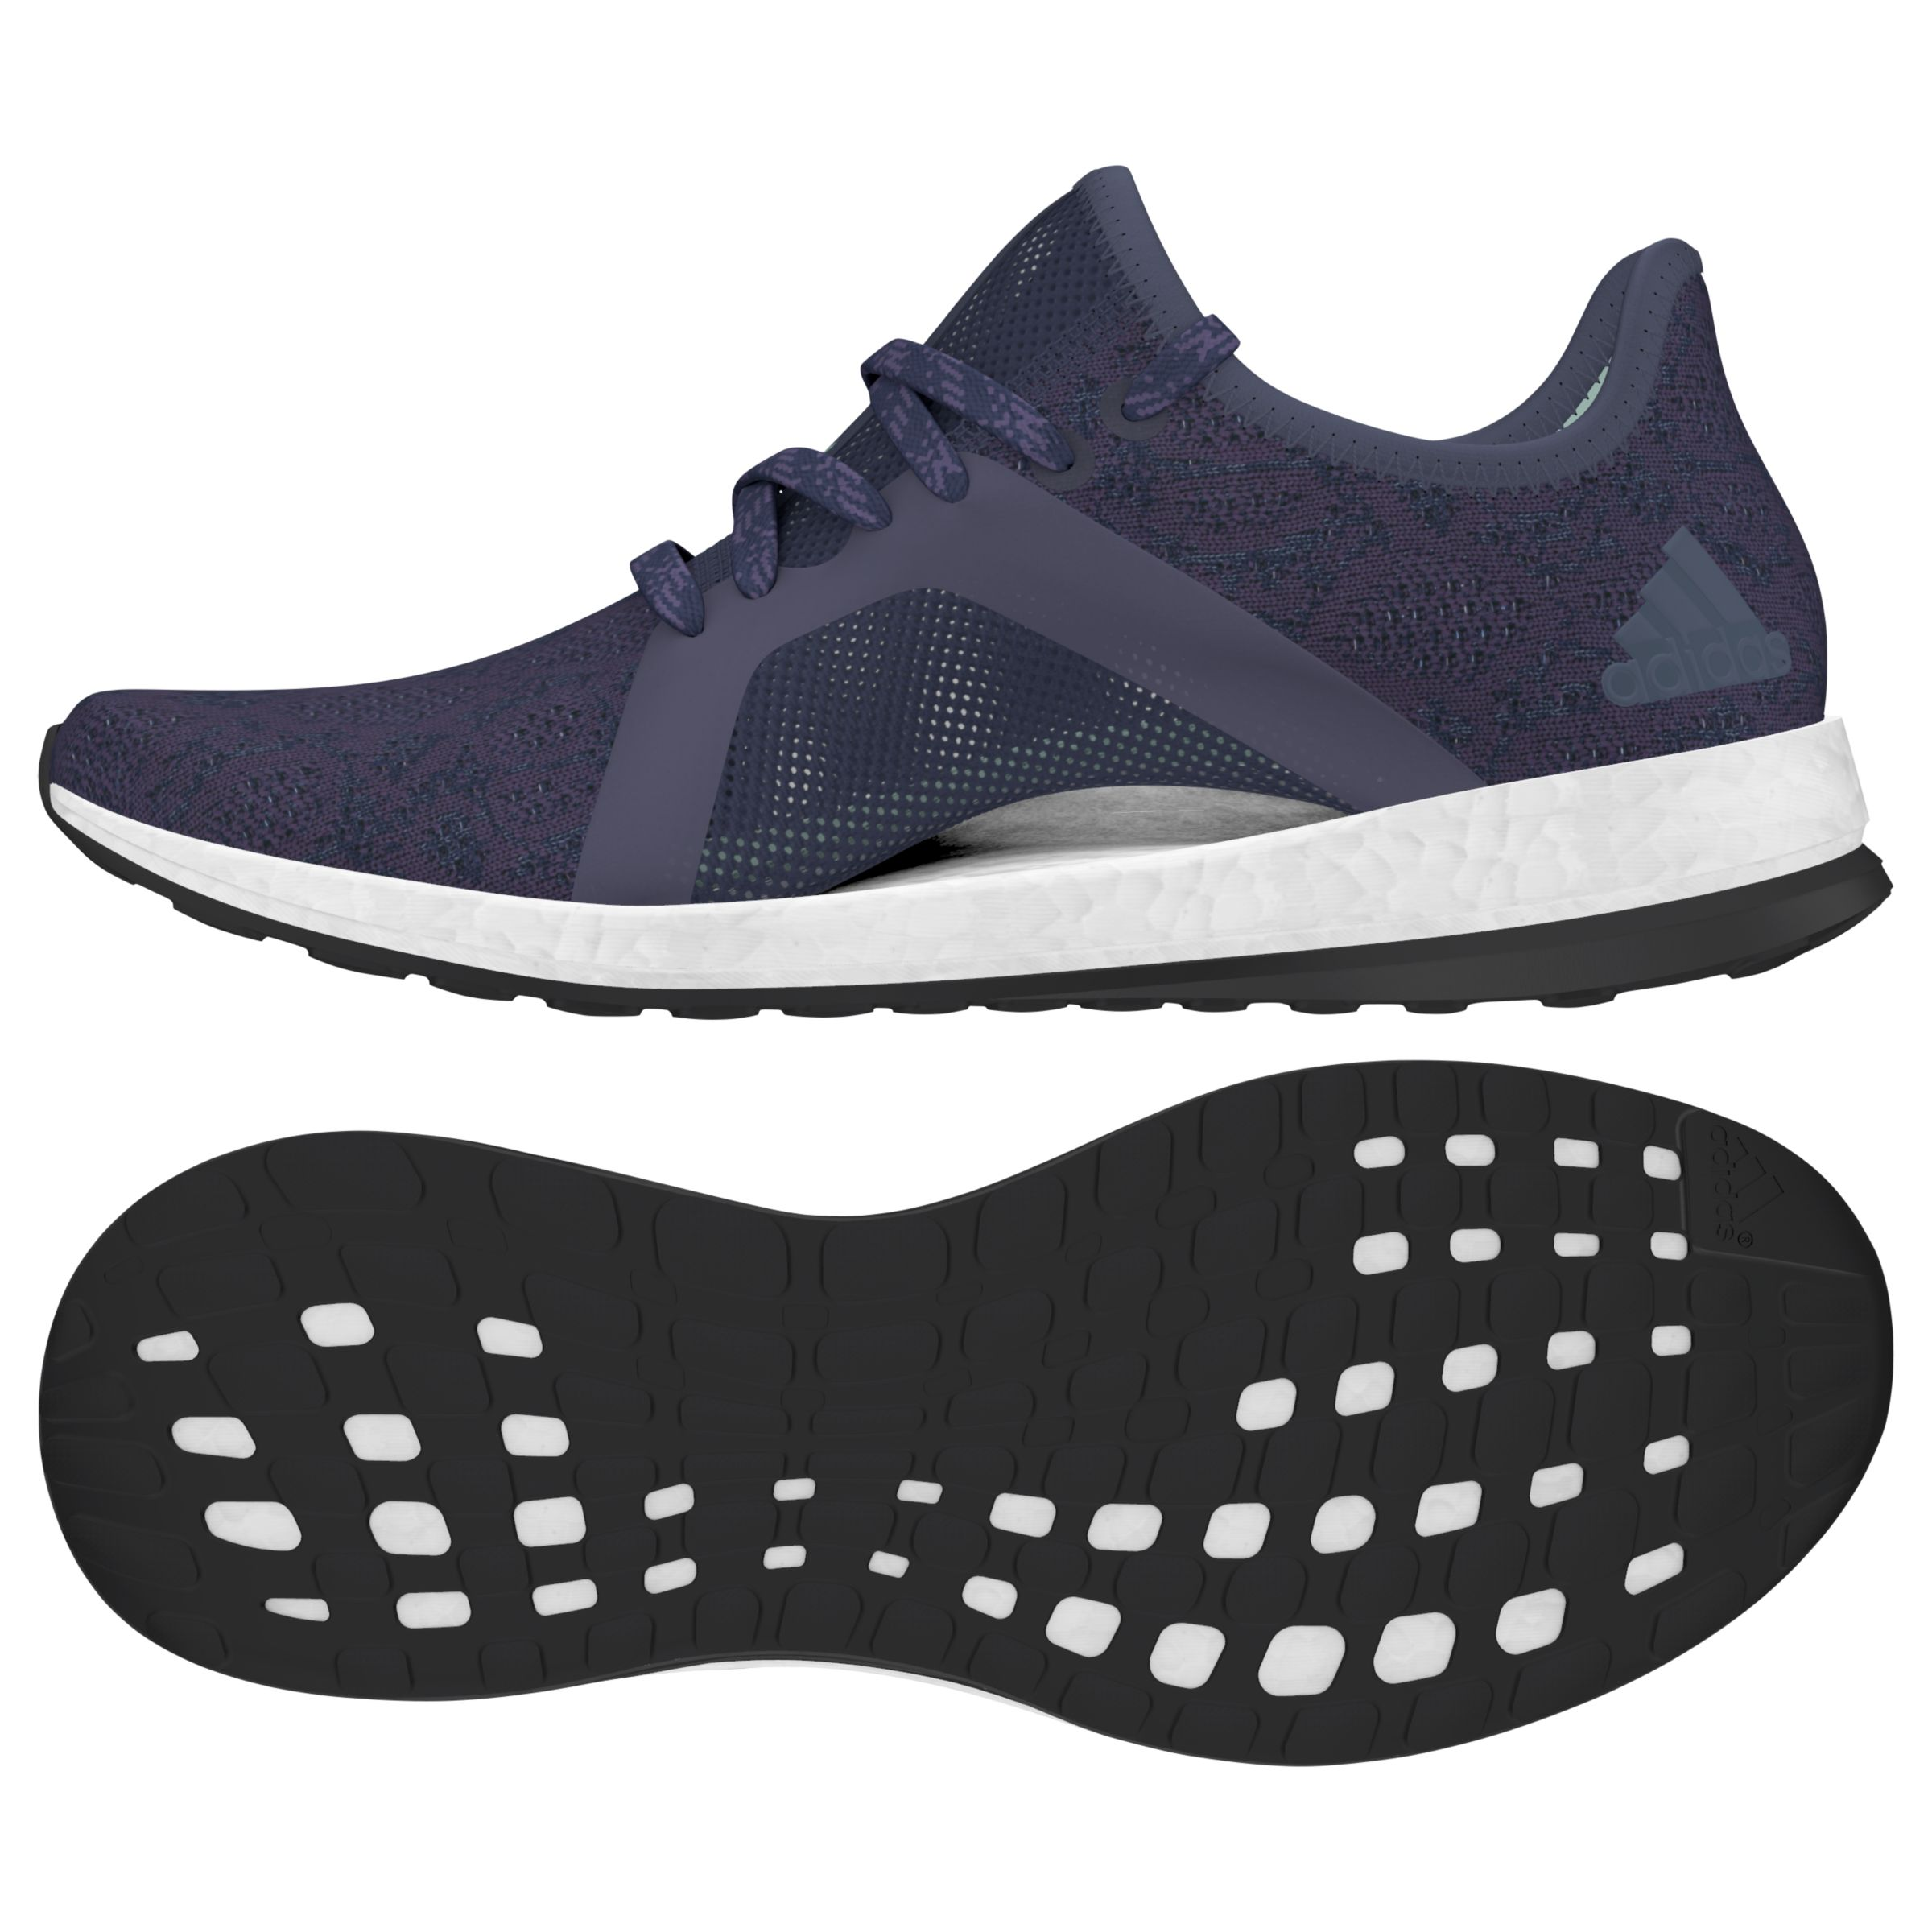 6c3c54a56 Adidas Pureboost X Element Women s Running Shoes